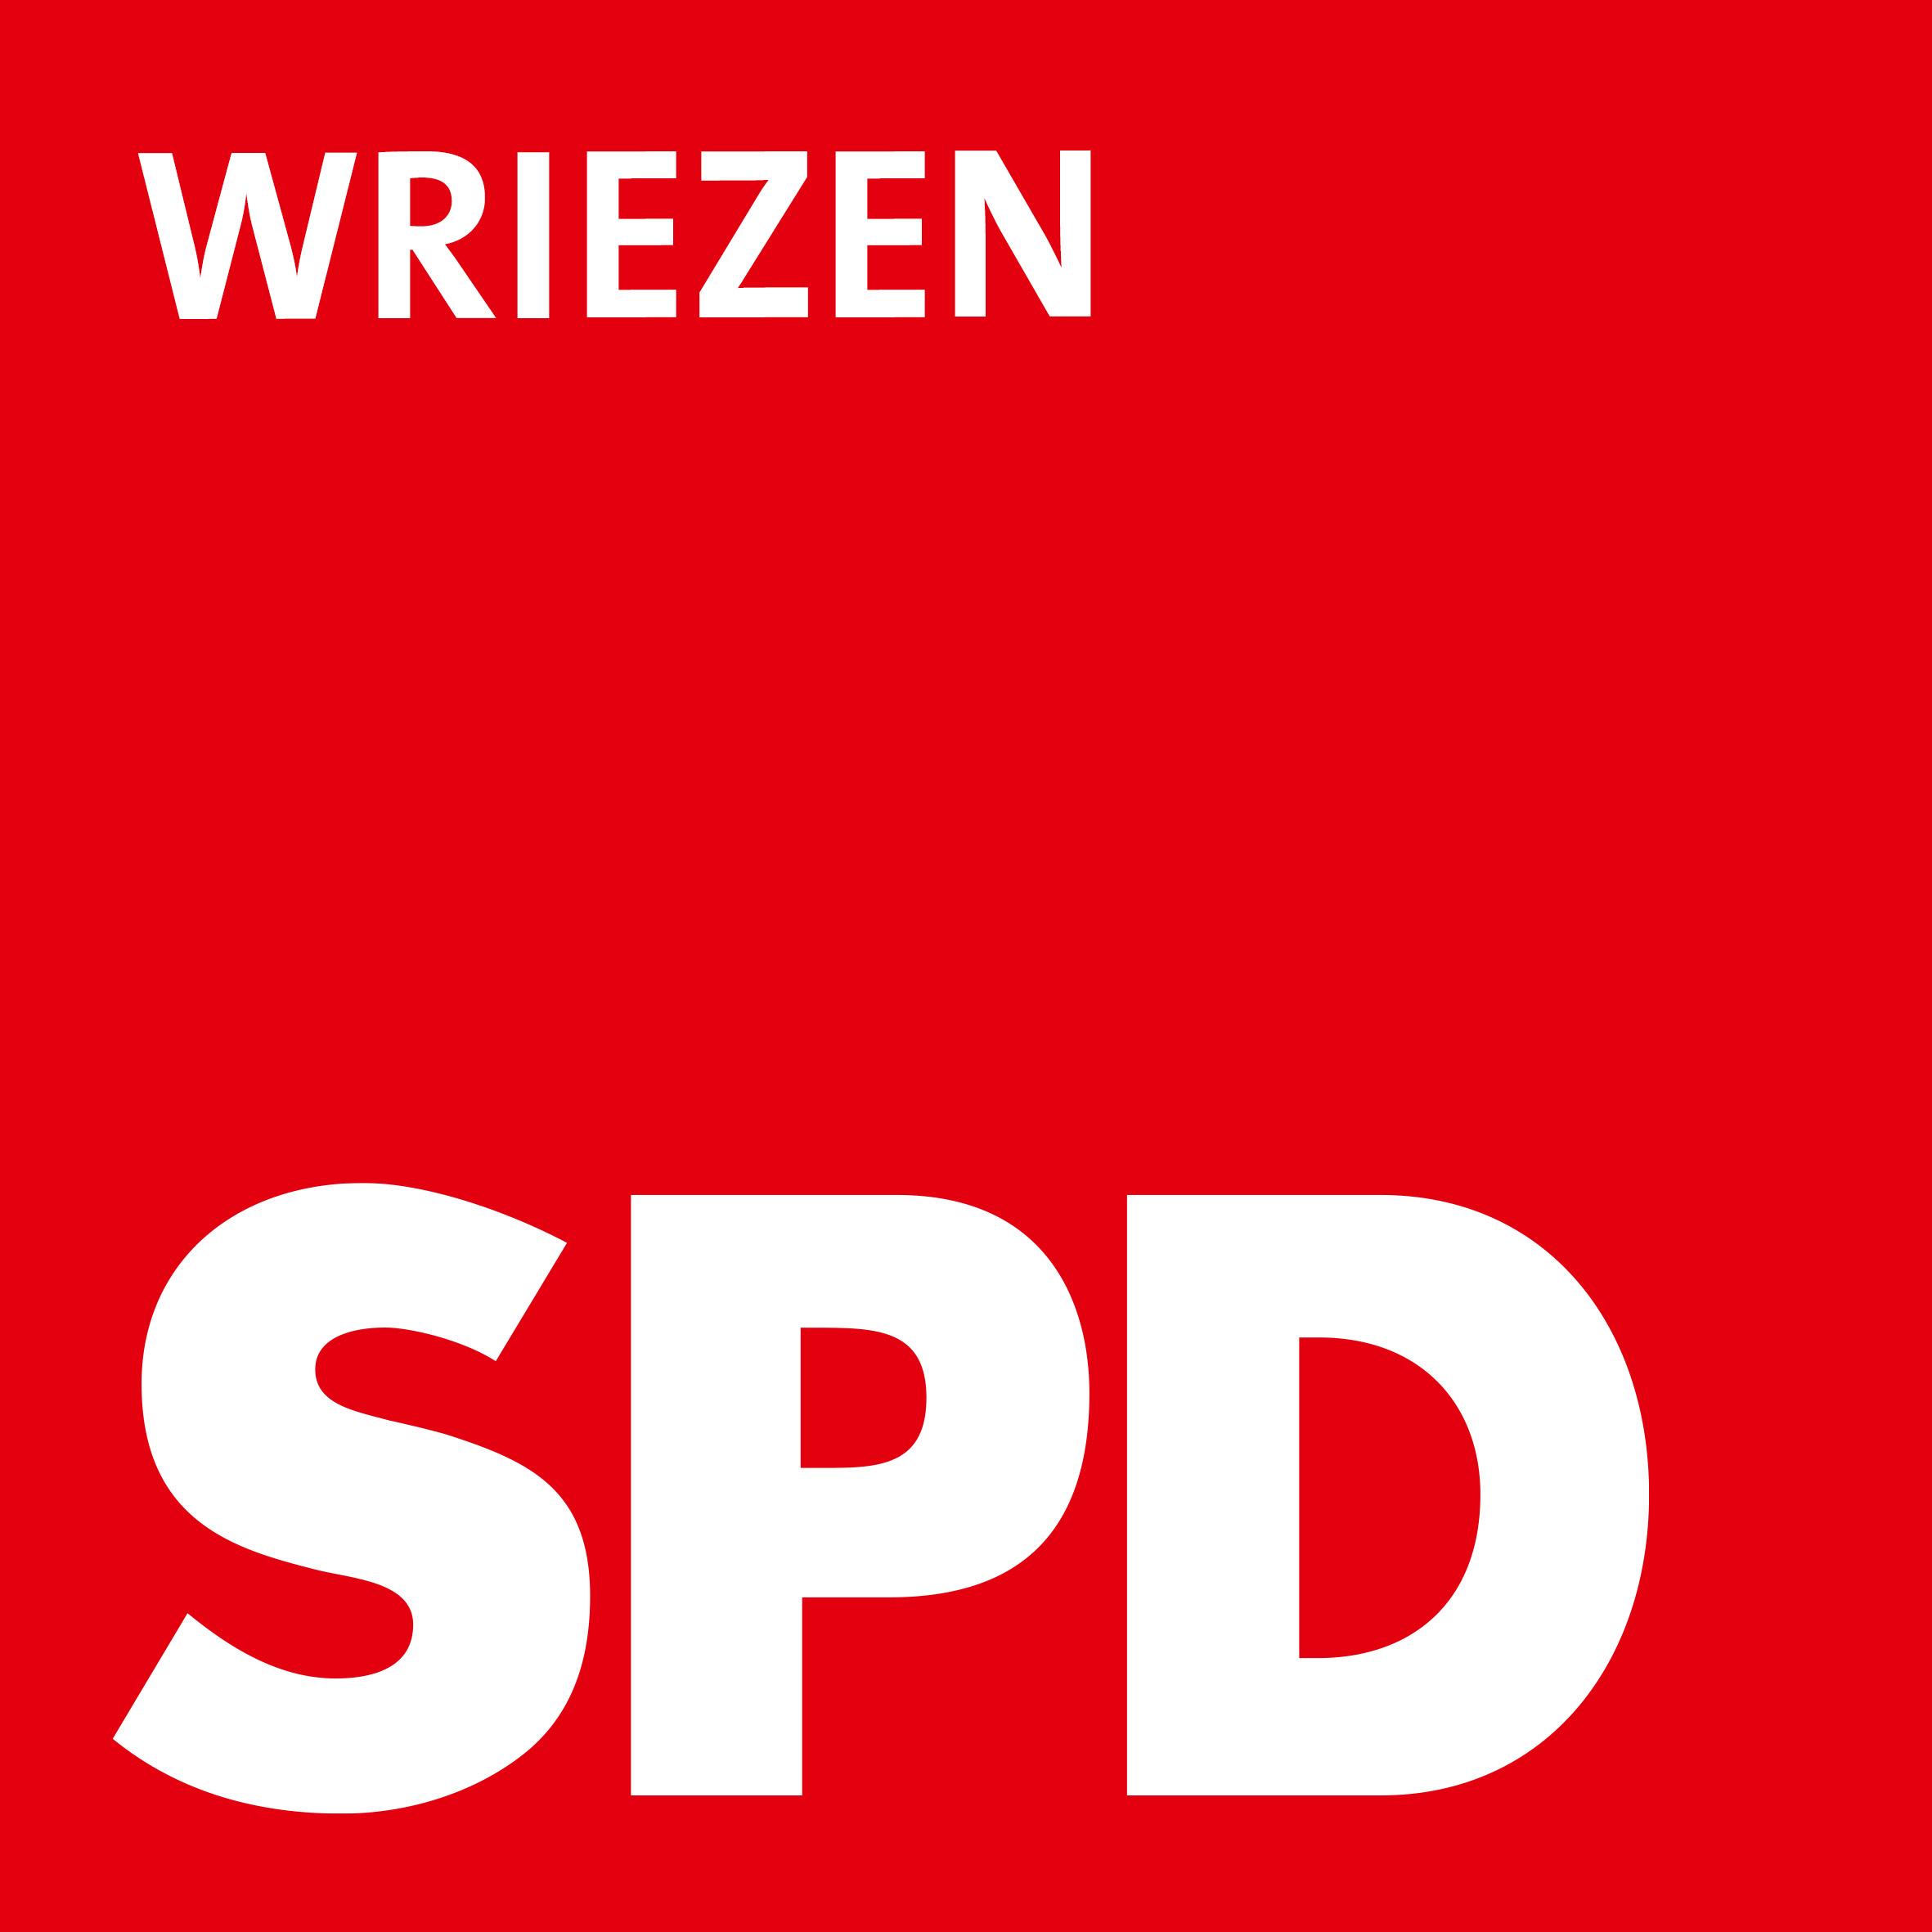 SPD Wriezen